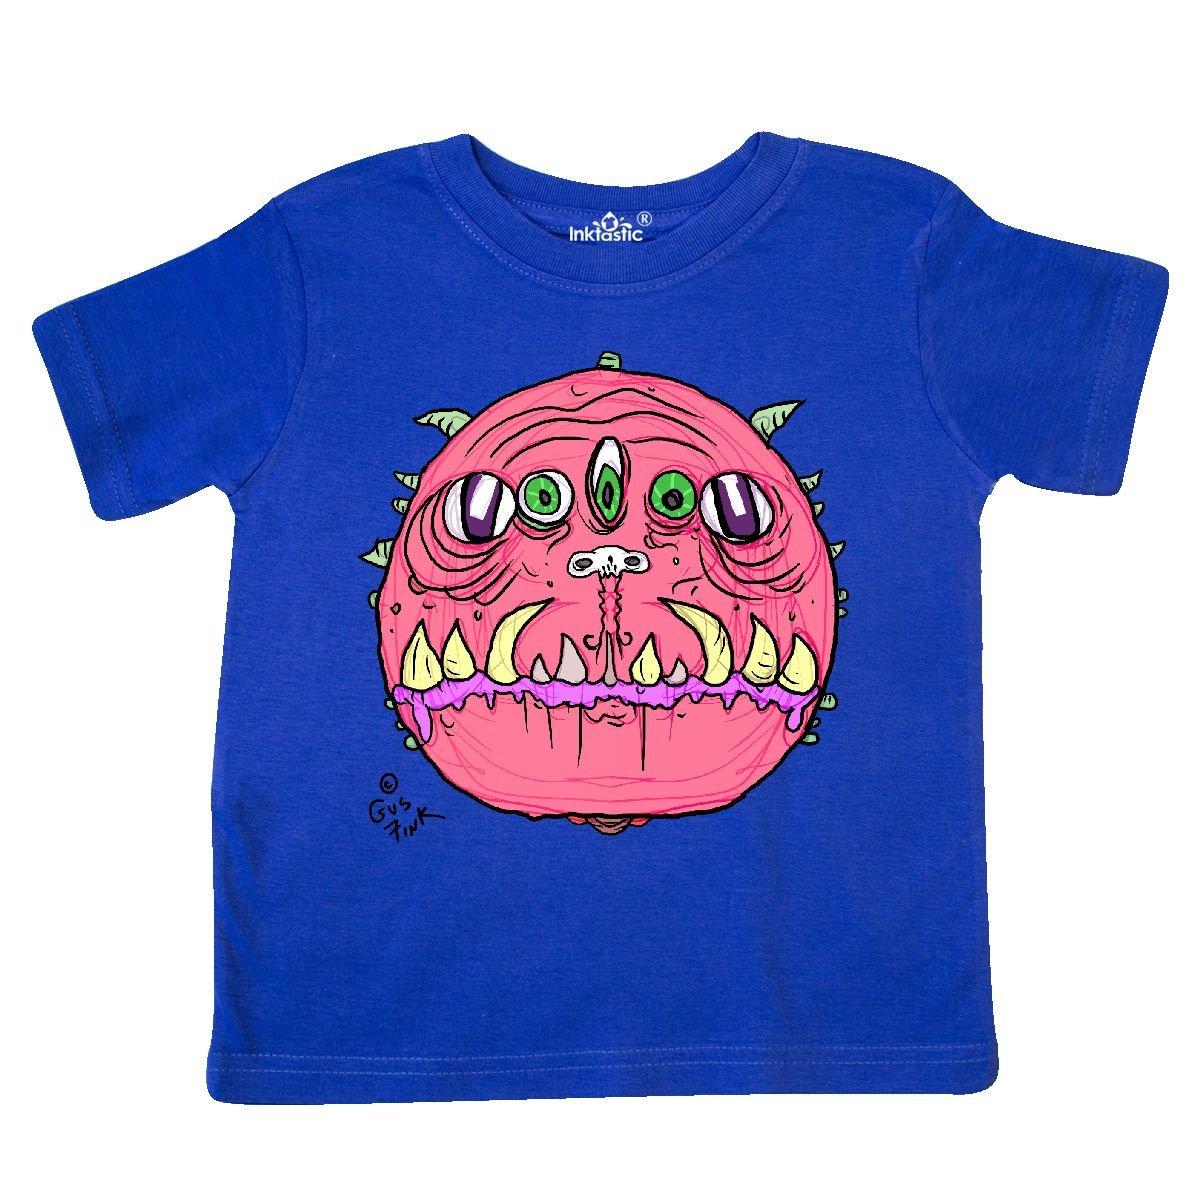 inktastic Pink Bore Toddler T-Shirt Gus Fink Studios